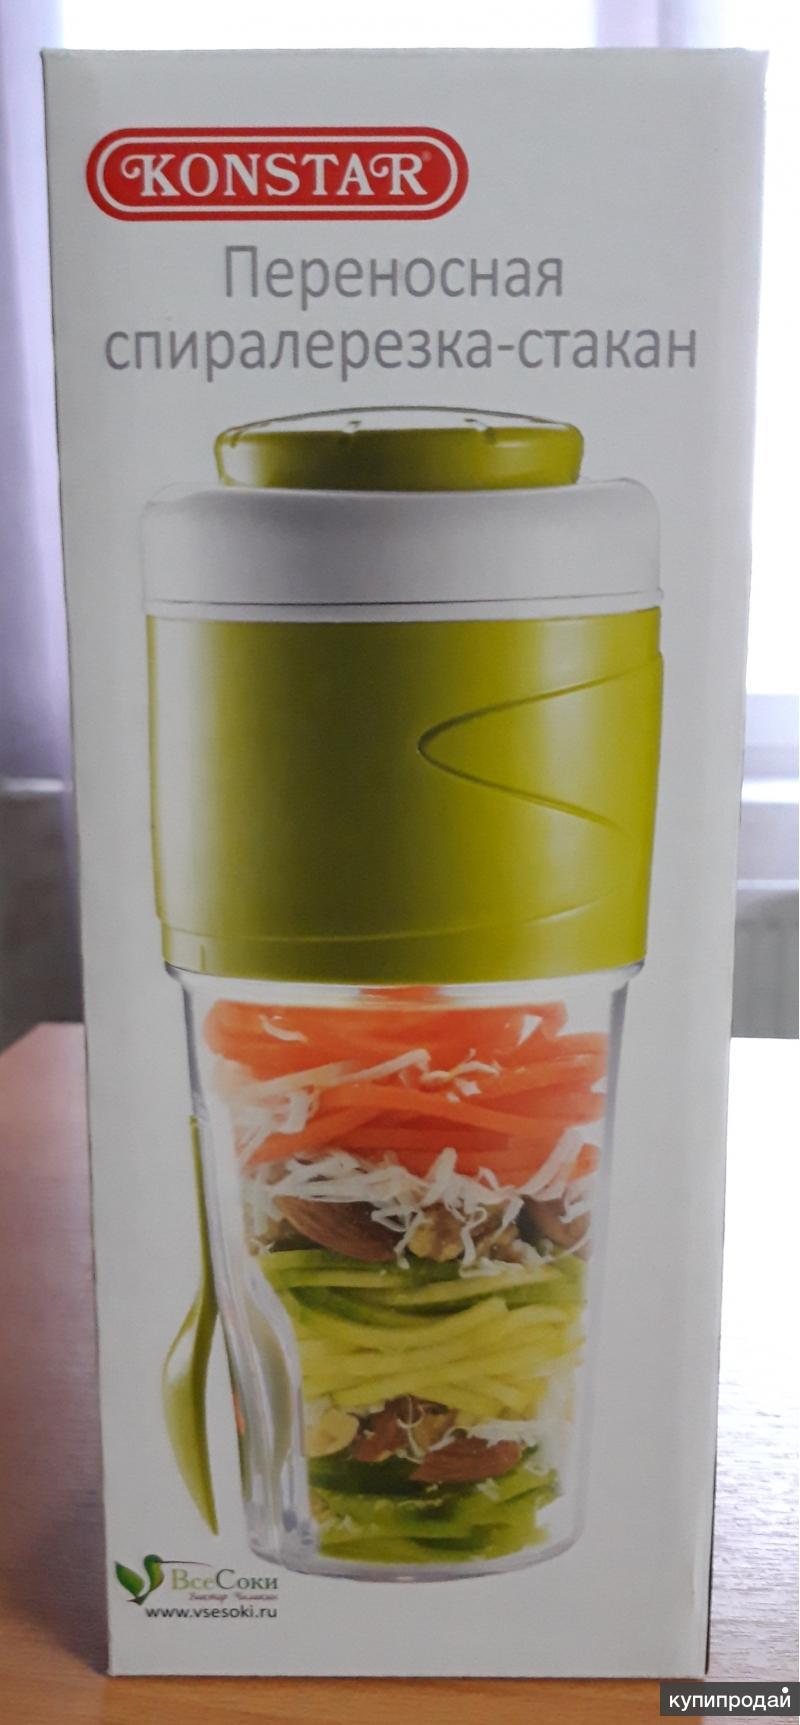 Спиральная овощерезка-стакан